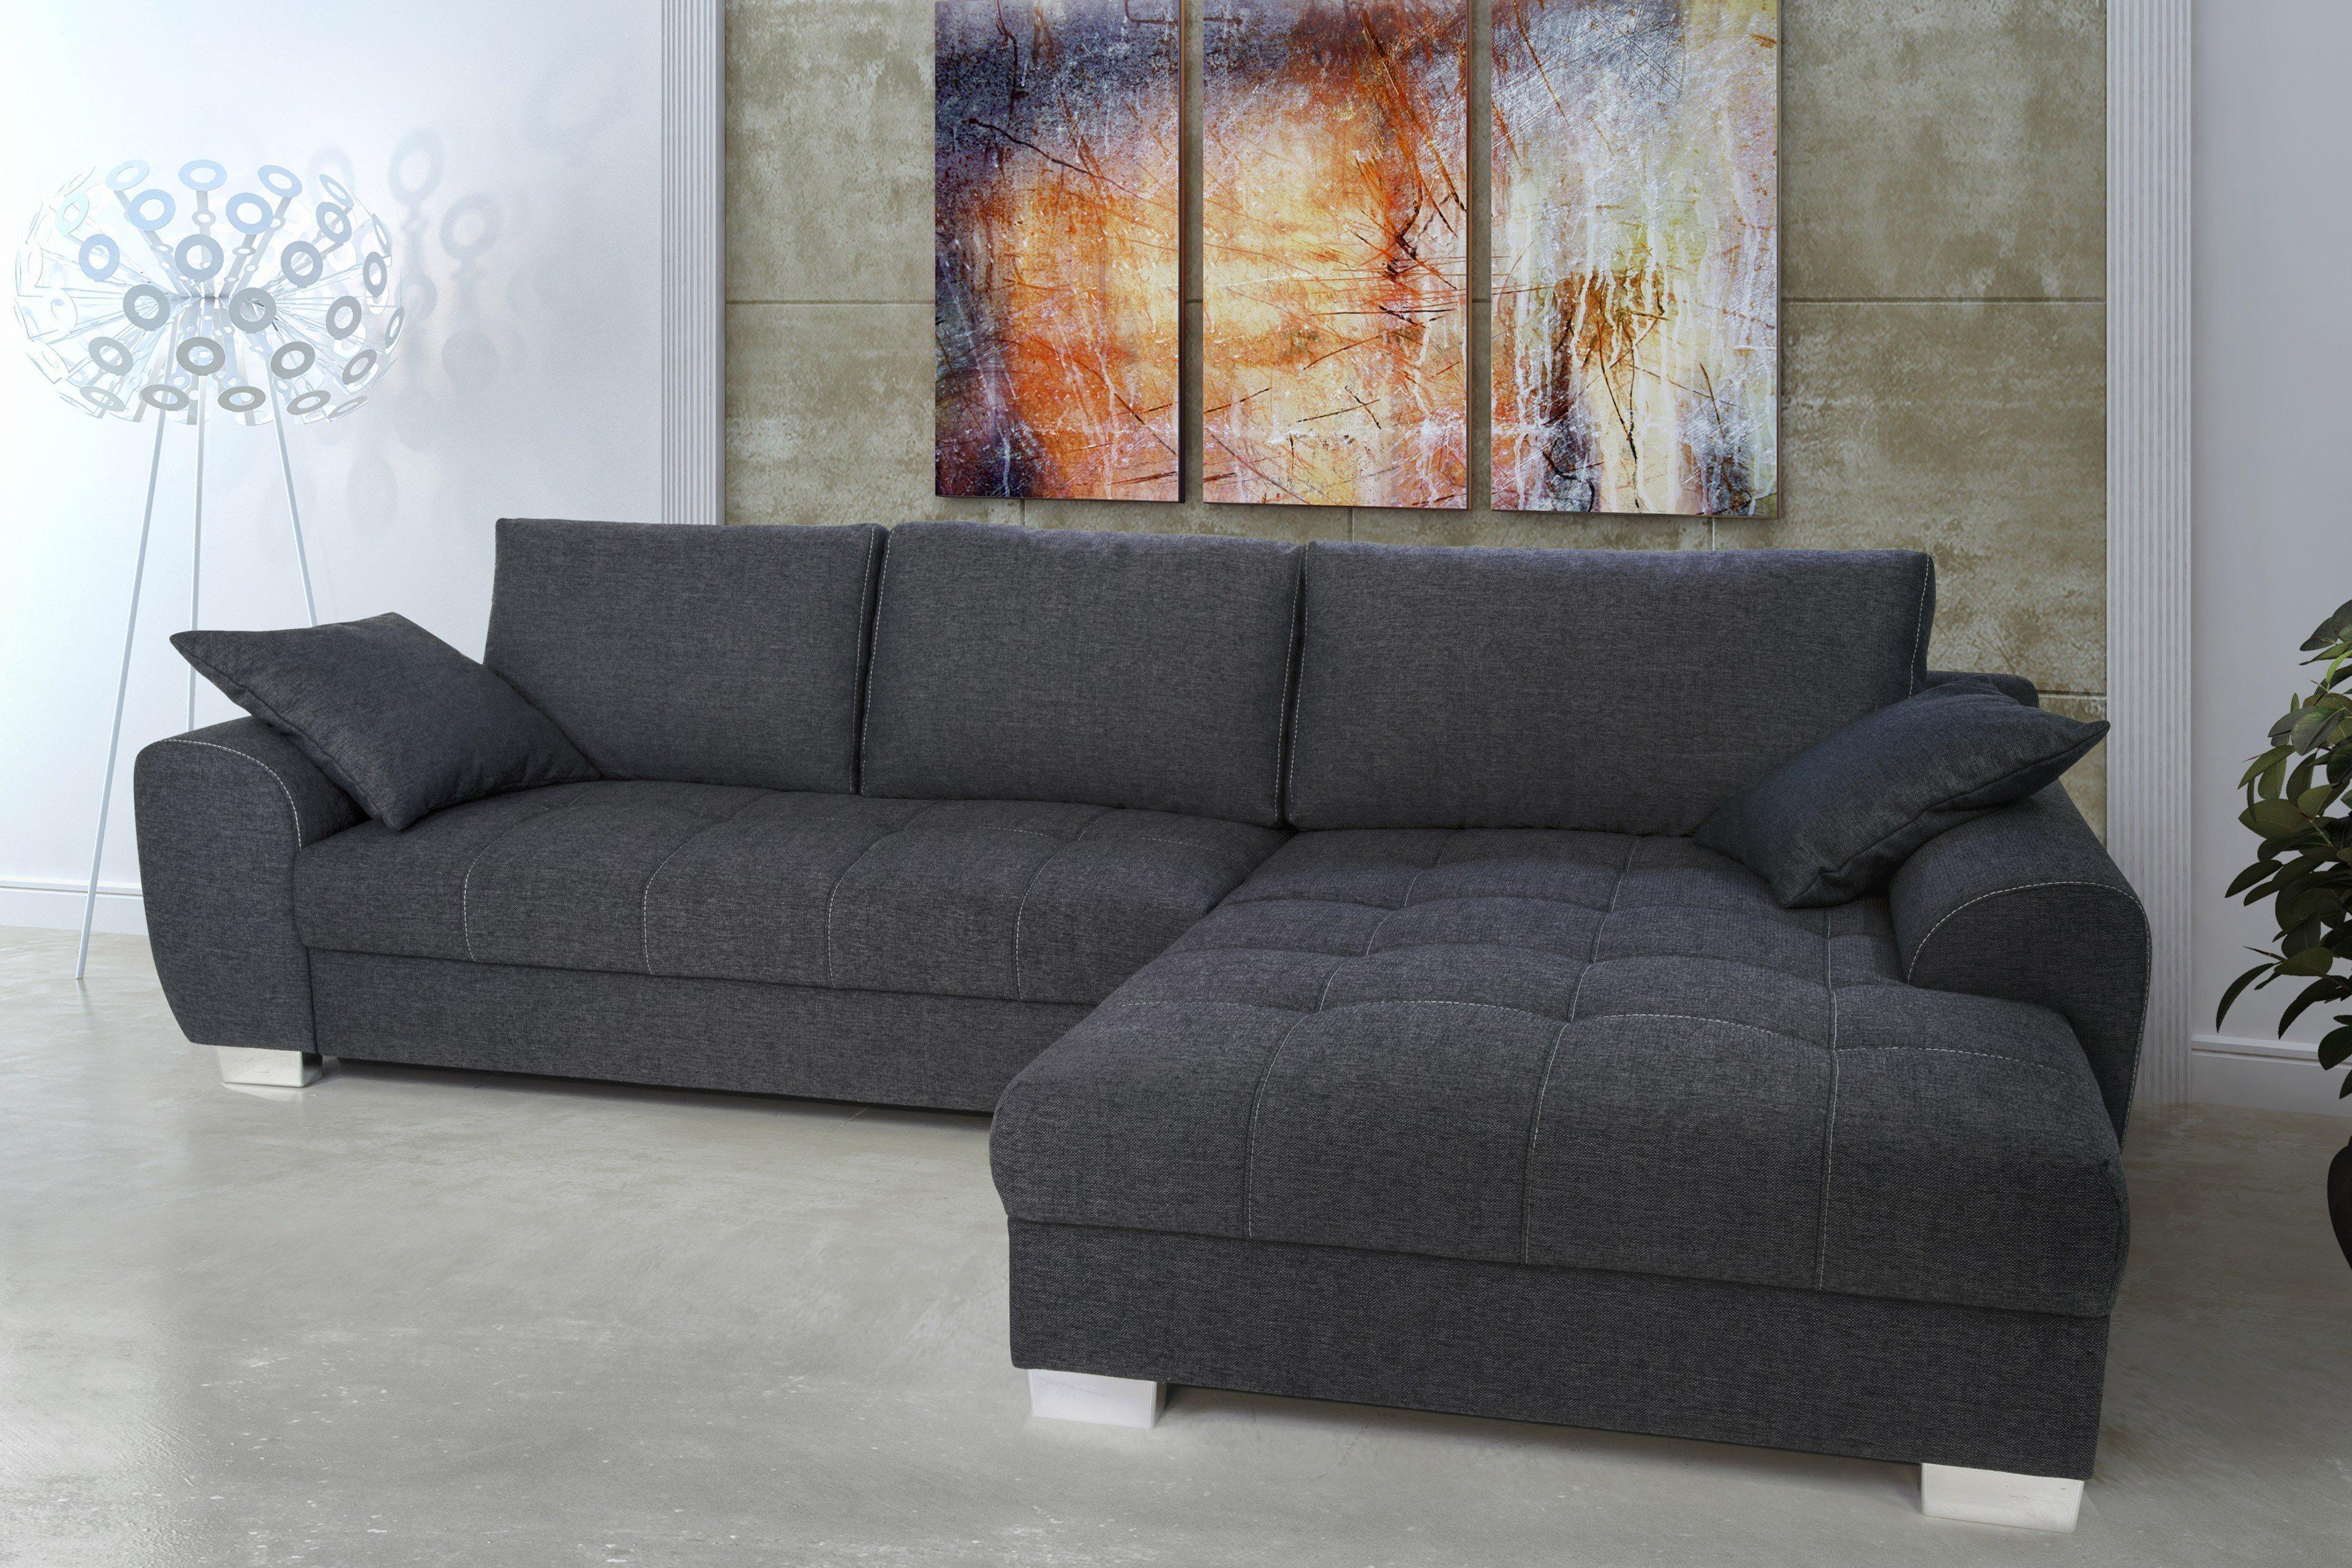 Nova via sevilla eckgarnitur grau m bel letz ihr - Factory sofas sevilla ...